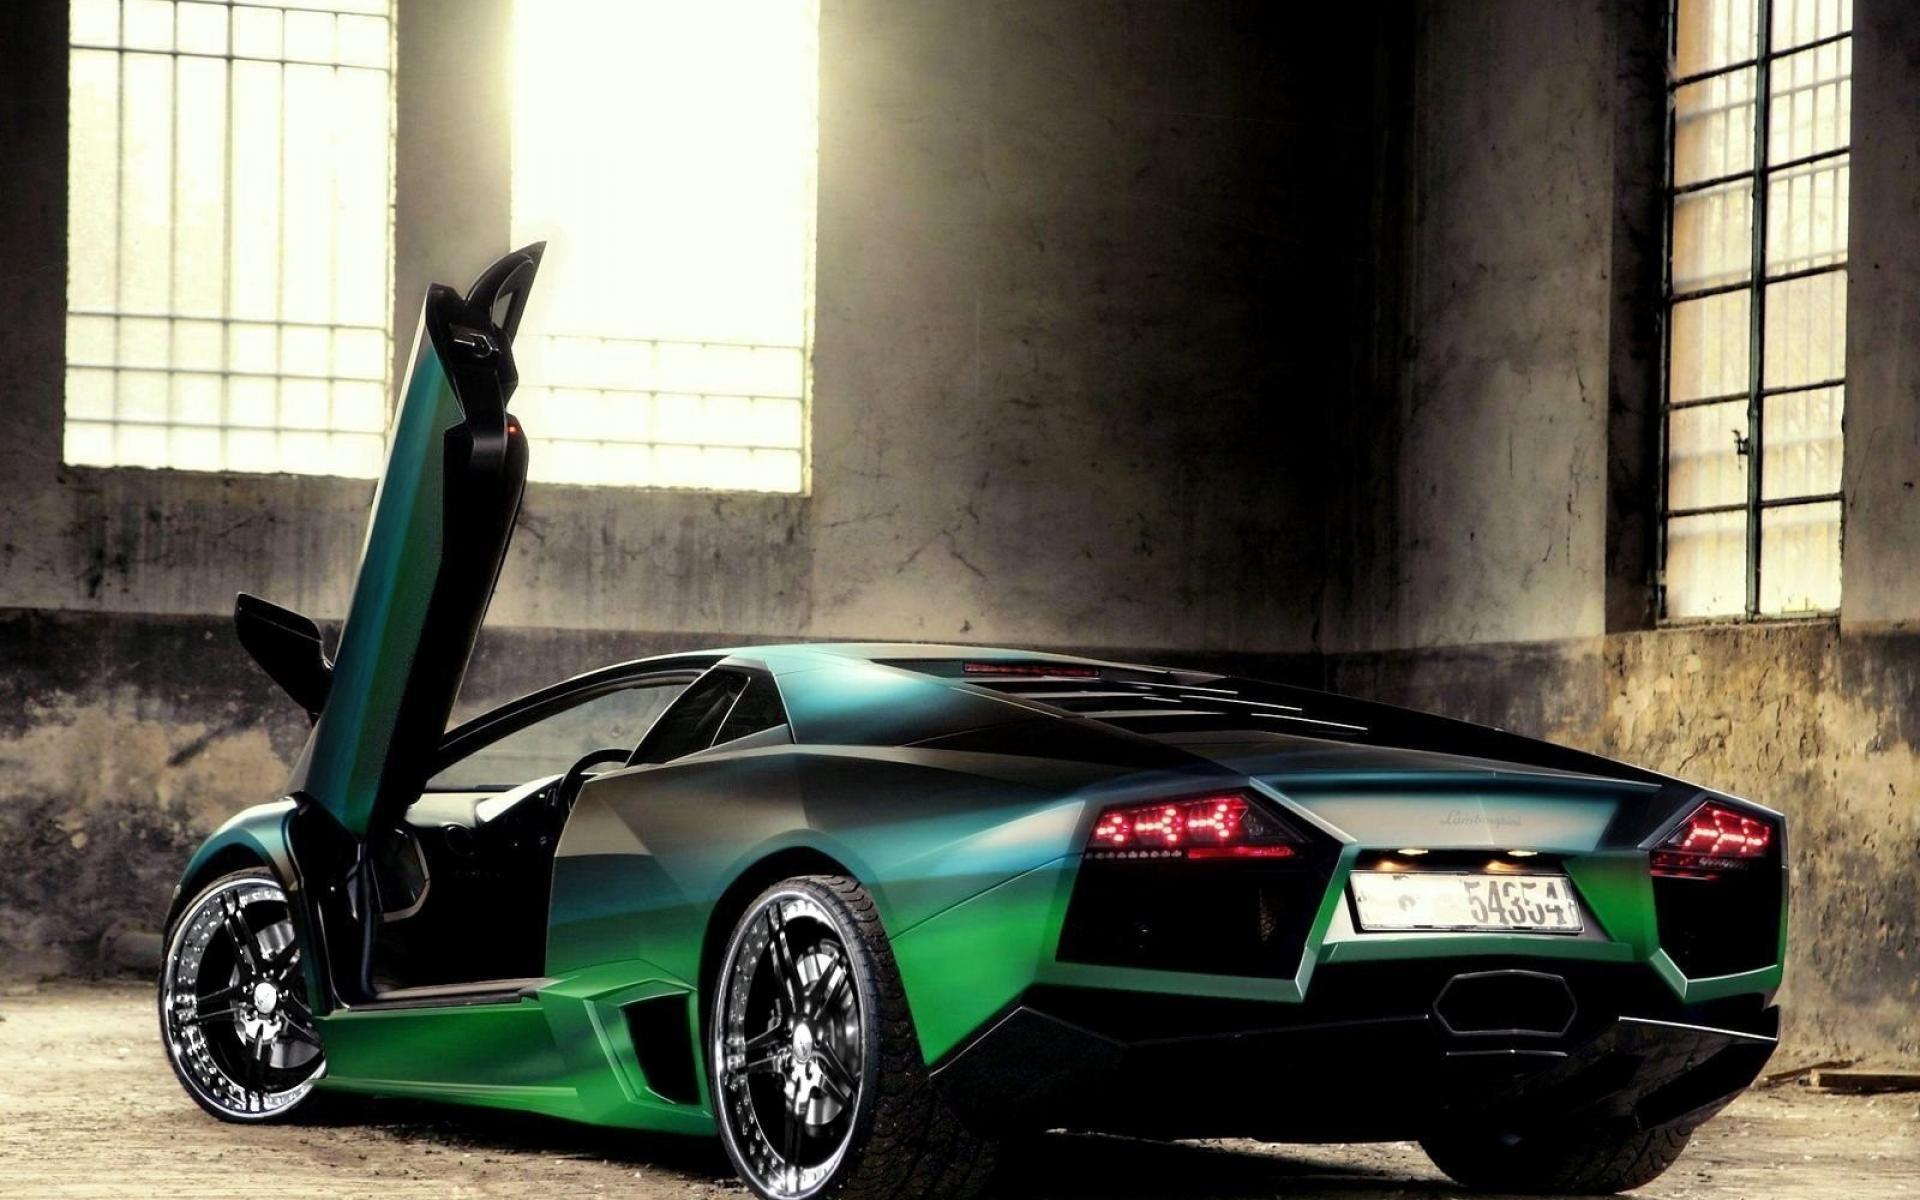 3d Wallpapers Lamborghini Wallpapers: Lamborghini Reventon Pictures Wallpapers